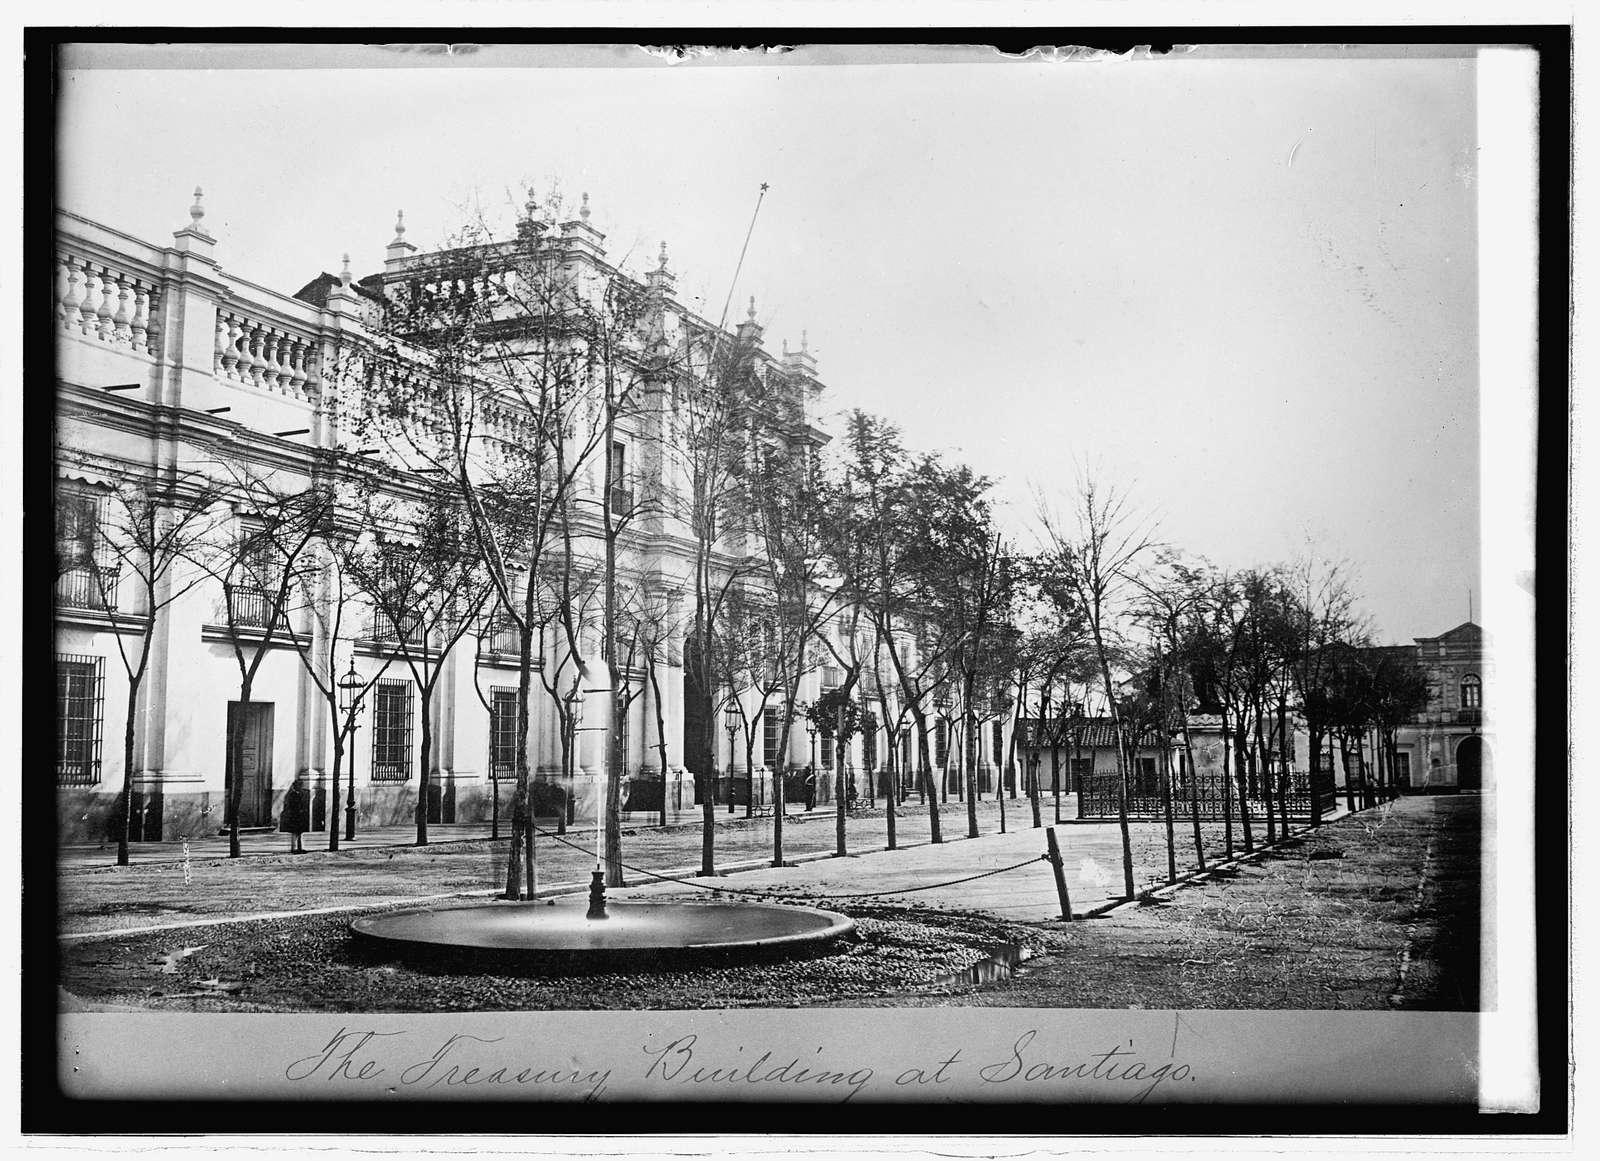 Treasury Bldg., Santiago